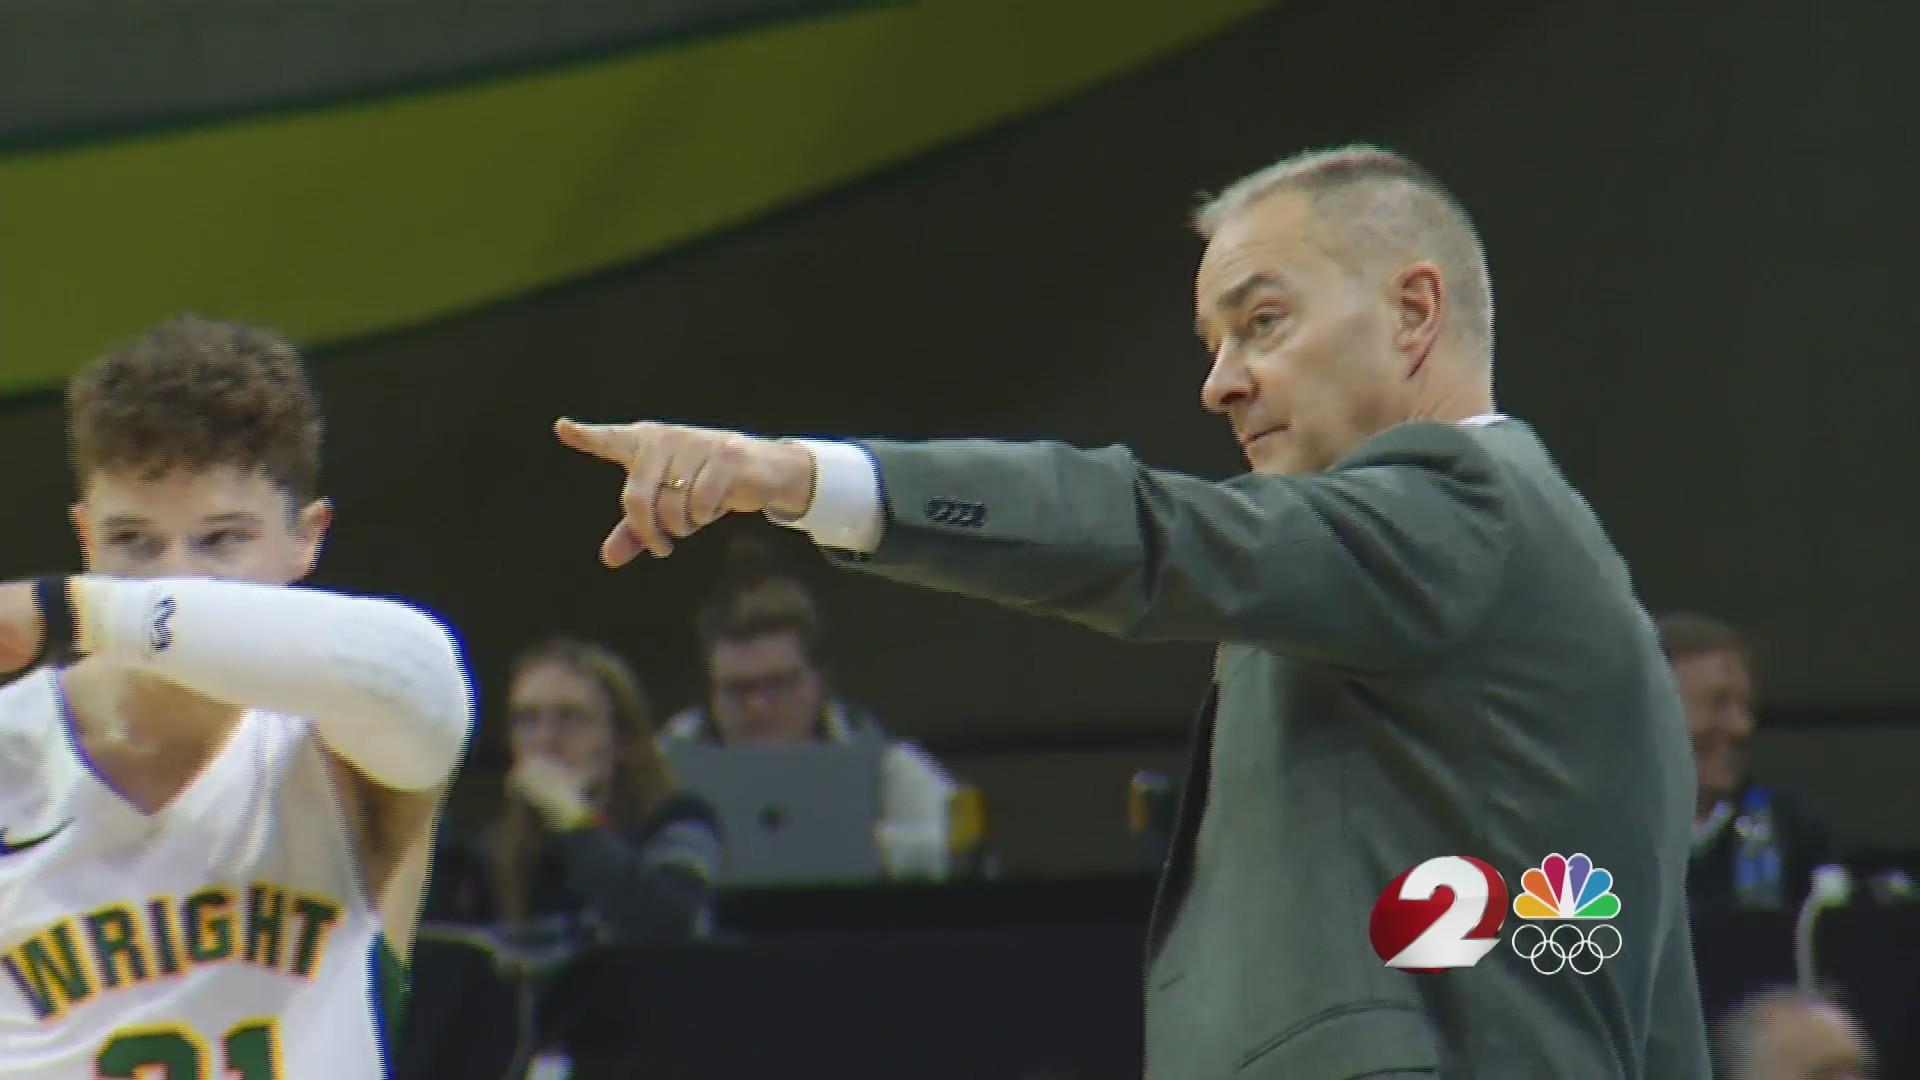 WSU Athletic Director discusses historic season ahead of Horizon League semifinals